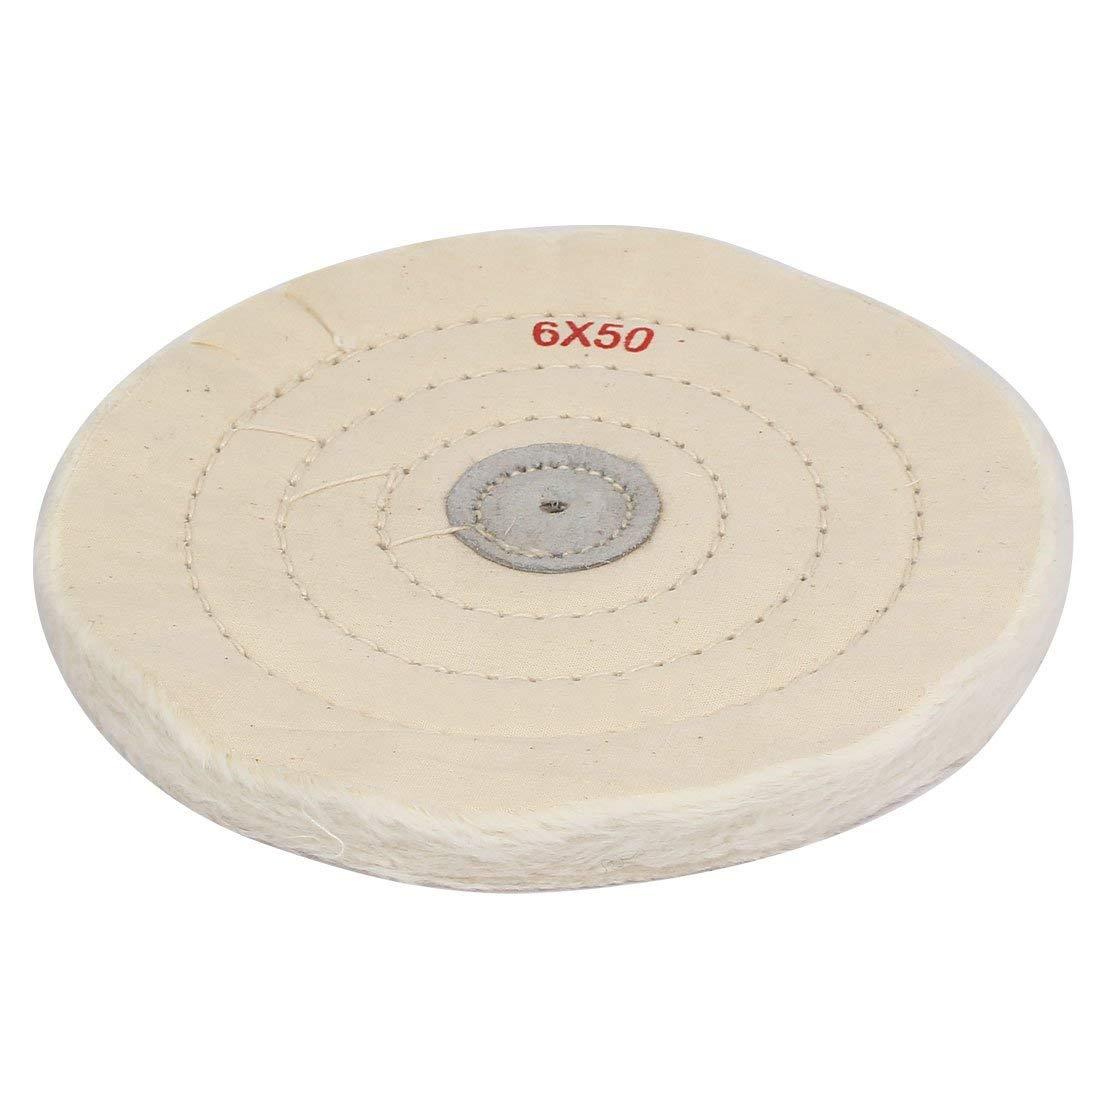 Haobase 8 Inch Buffing Polishing Wheel 1//2 Inch Arbor Buffer Polish White Round Wheel 50 Play Cleaning Cloth Buffing Wheel Tool